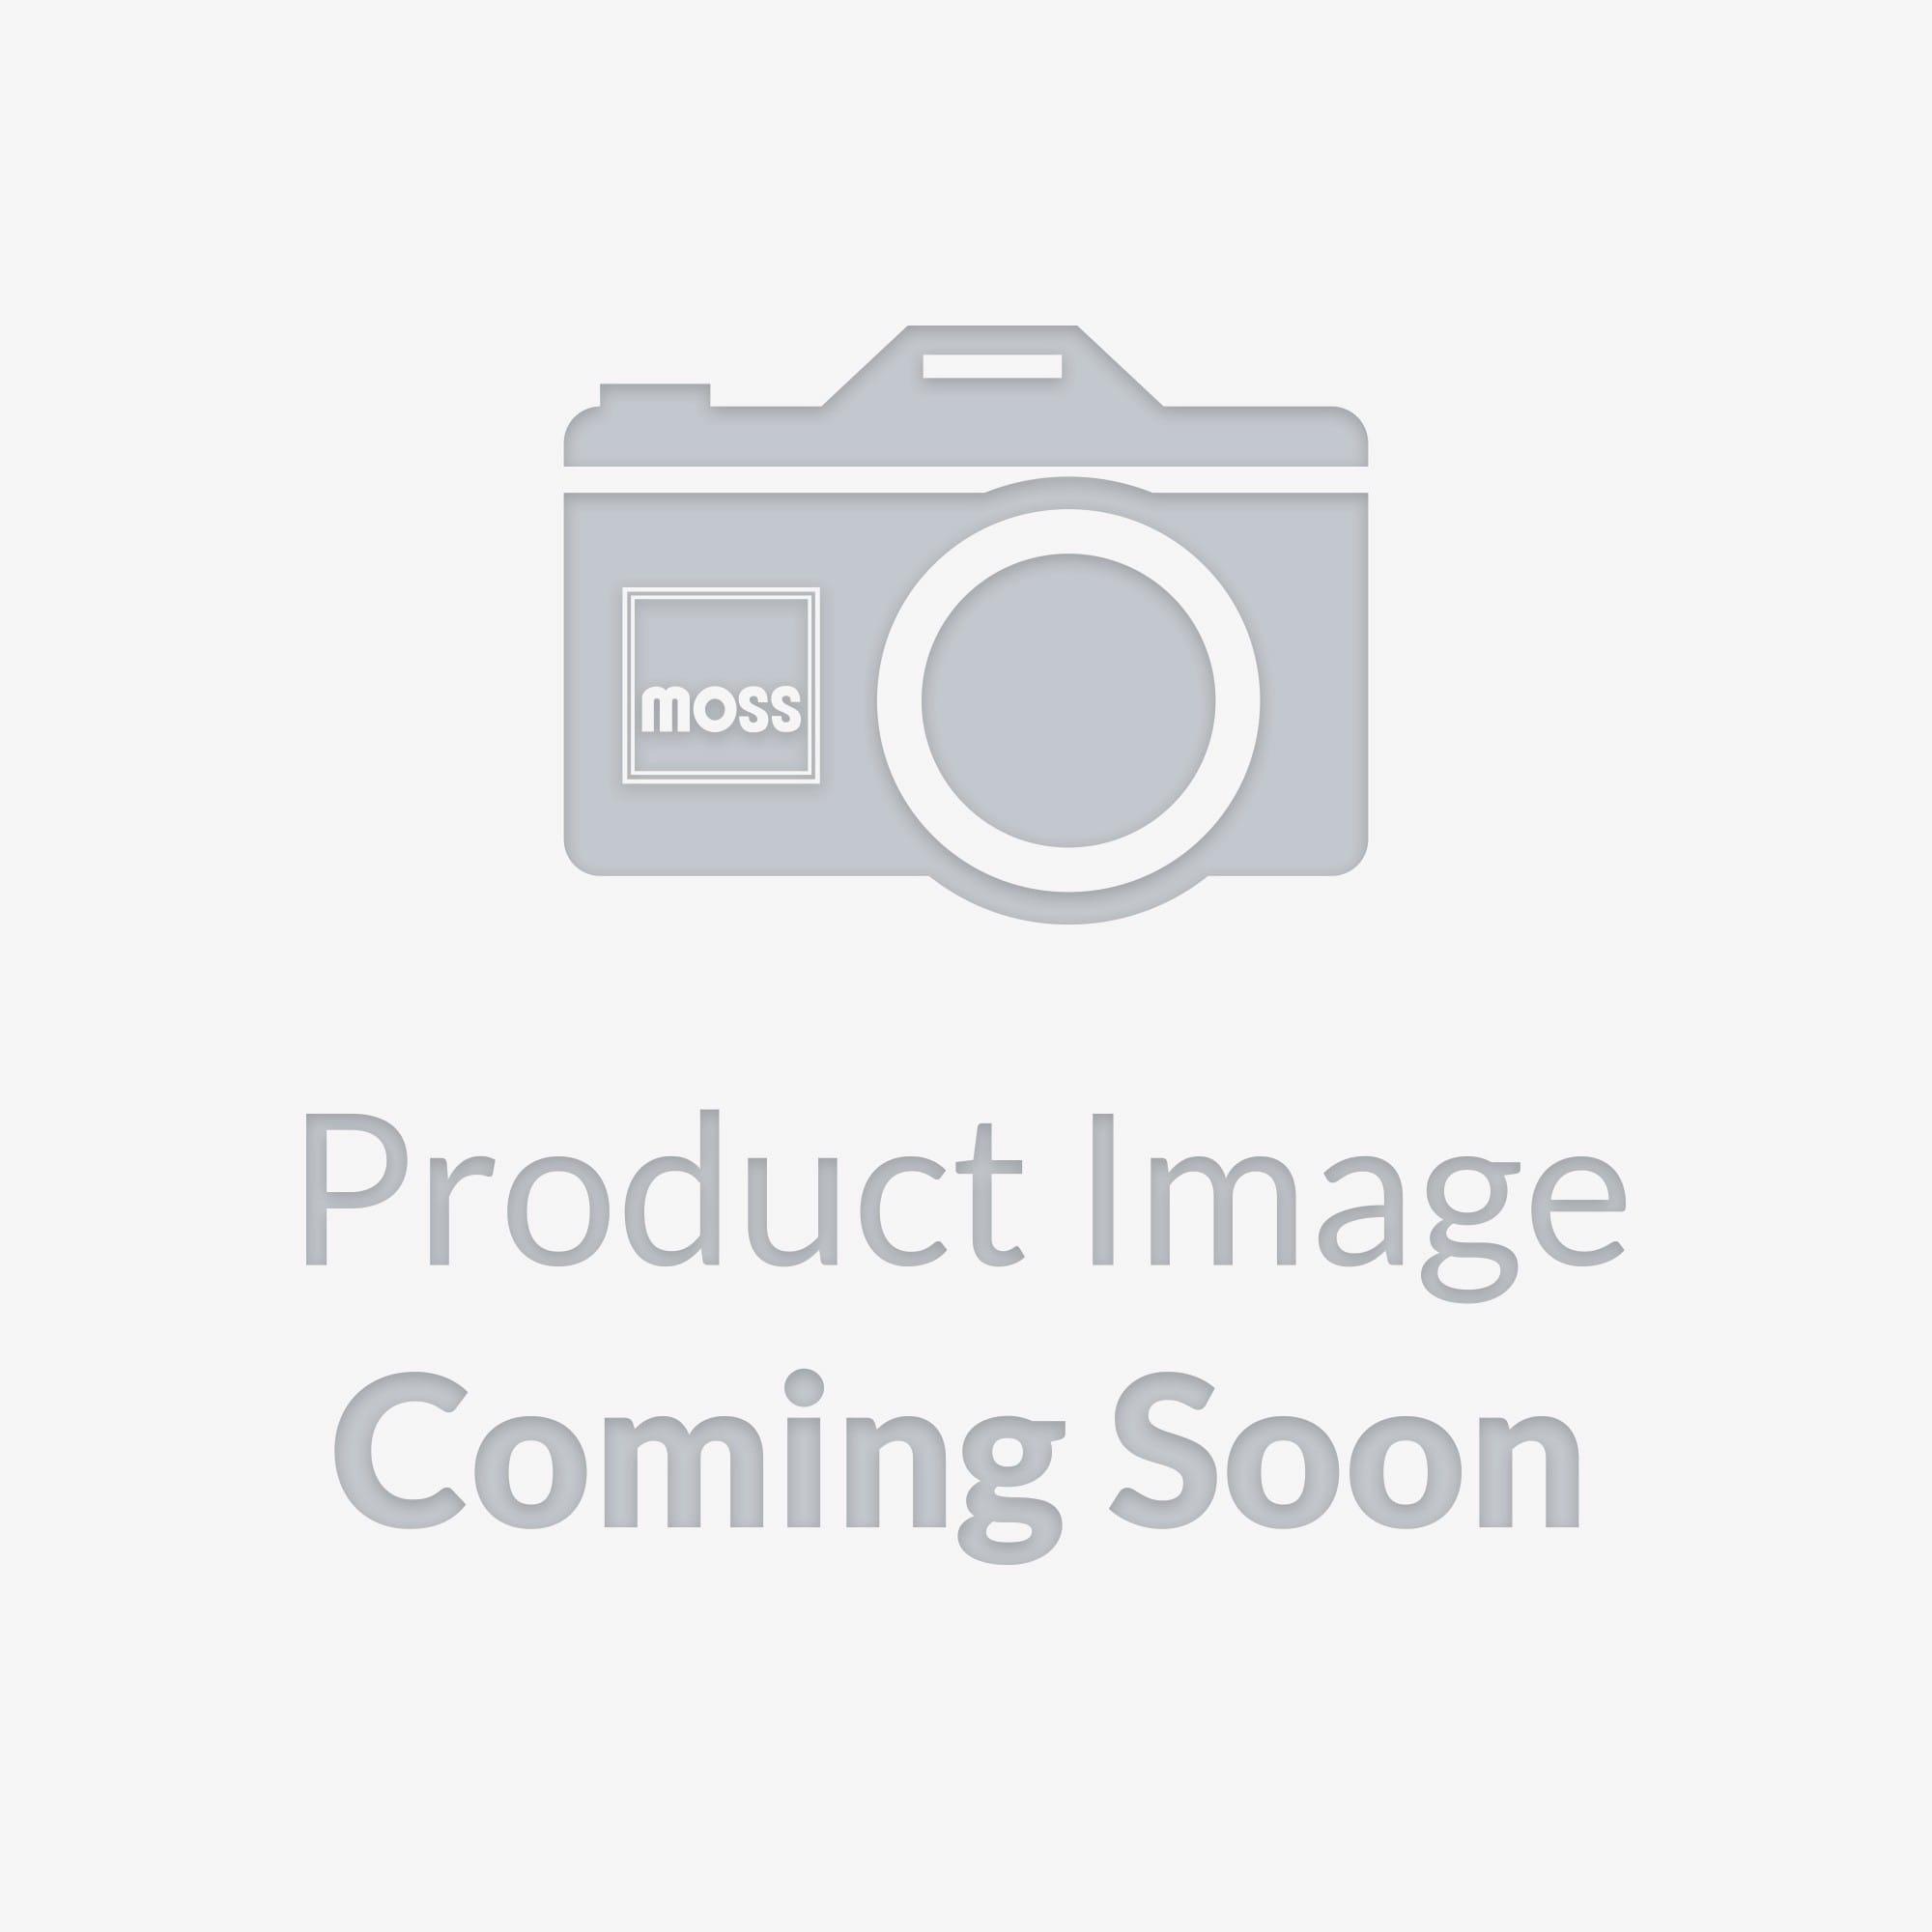 mg td wiring wiring diagram database 1953 MG Roadster wire wheels wheels knockoffs wheels tires mg tc td tf mg ta mg td wiring